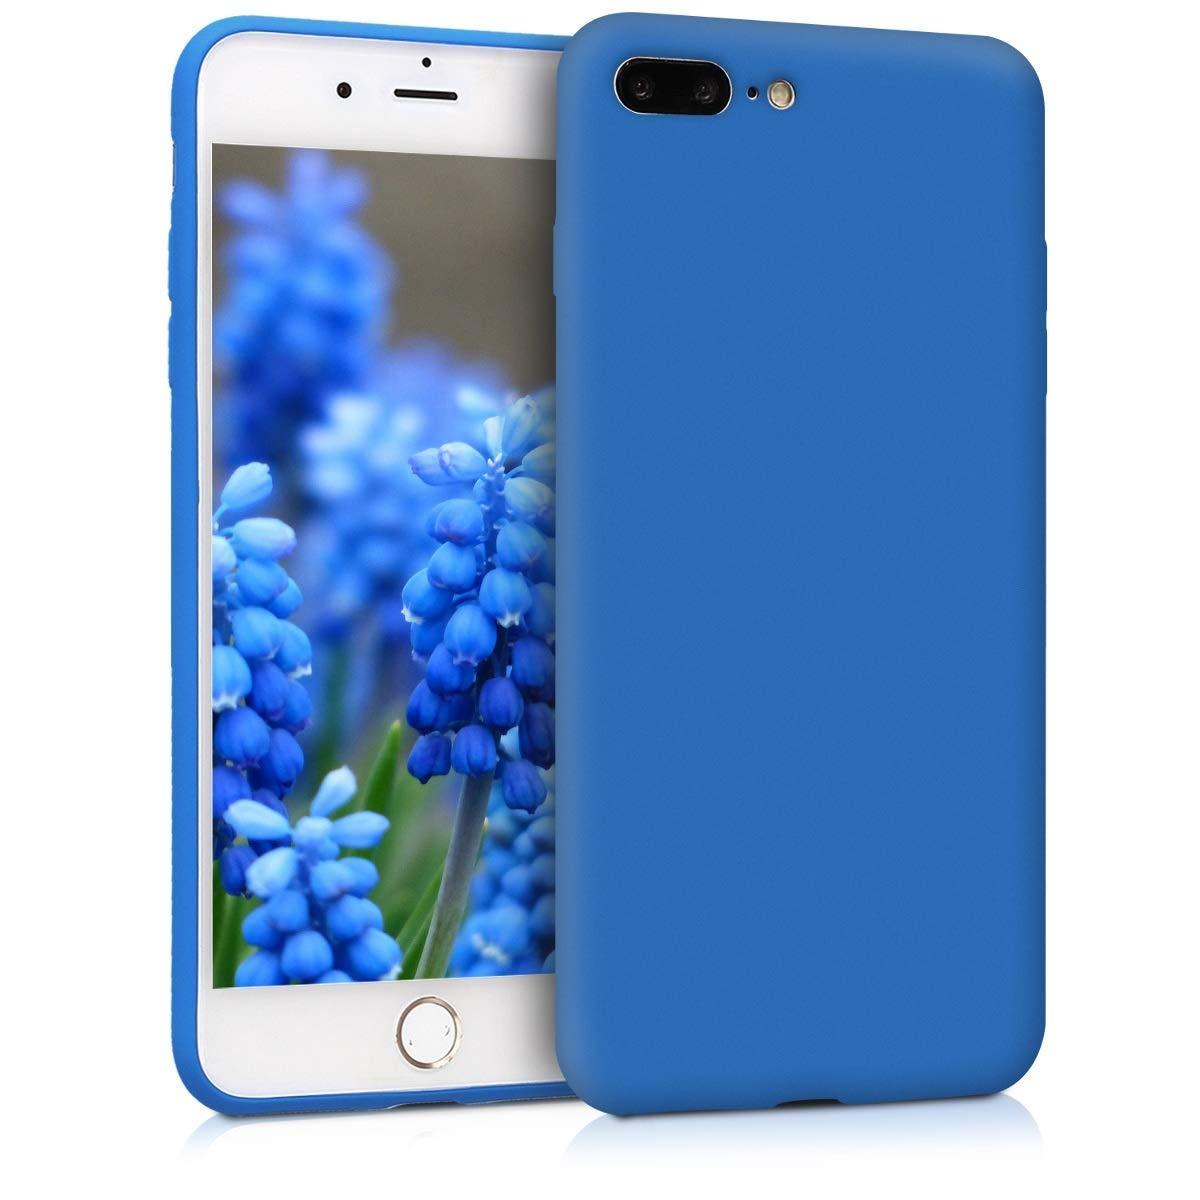 KW Θήκη Σιλικόνης iPhone 8 Plus / iPhone 7 Plus - Neon Blue (45354.104)